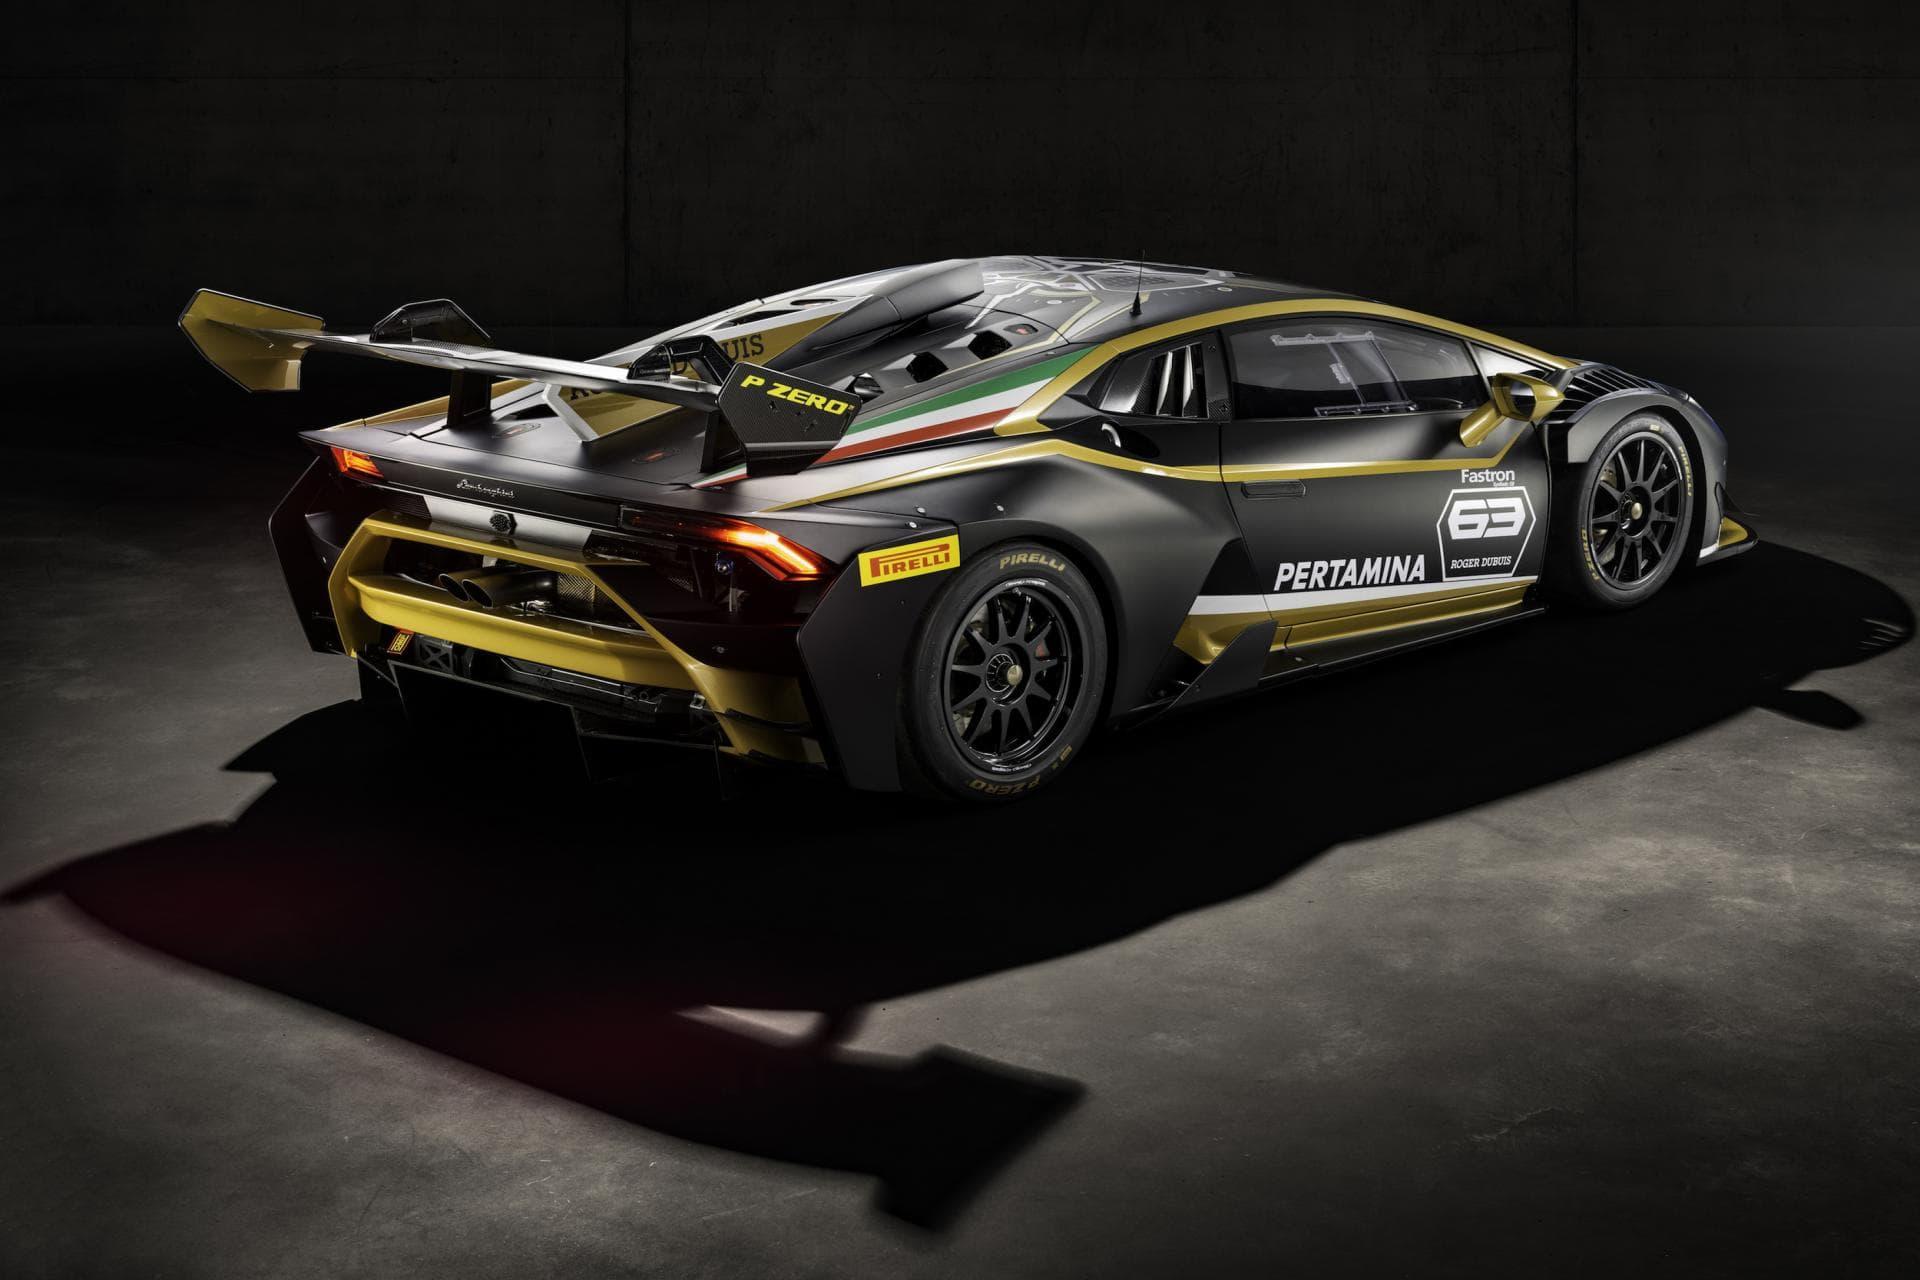 Lamborghini Huracan Super Trofeo Evo Collector 2019 Black Gold Endurance Info English Spoken